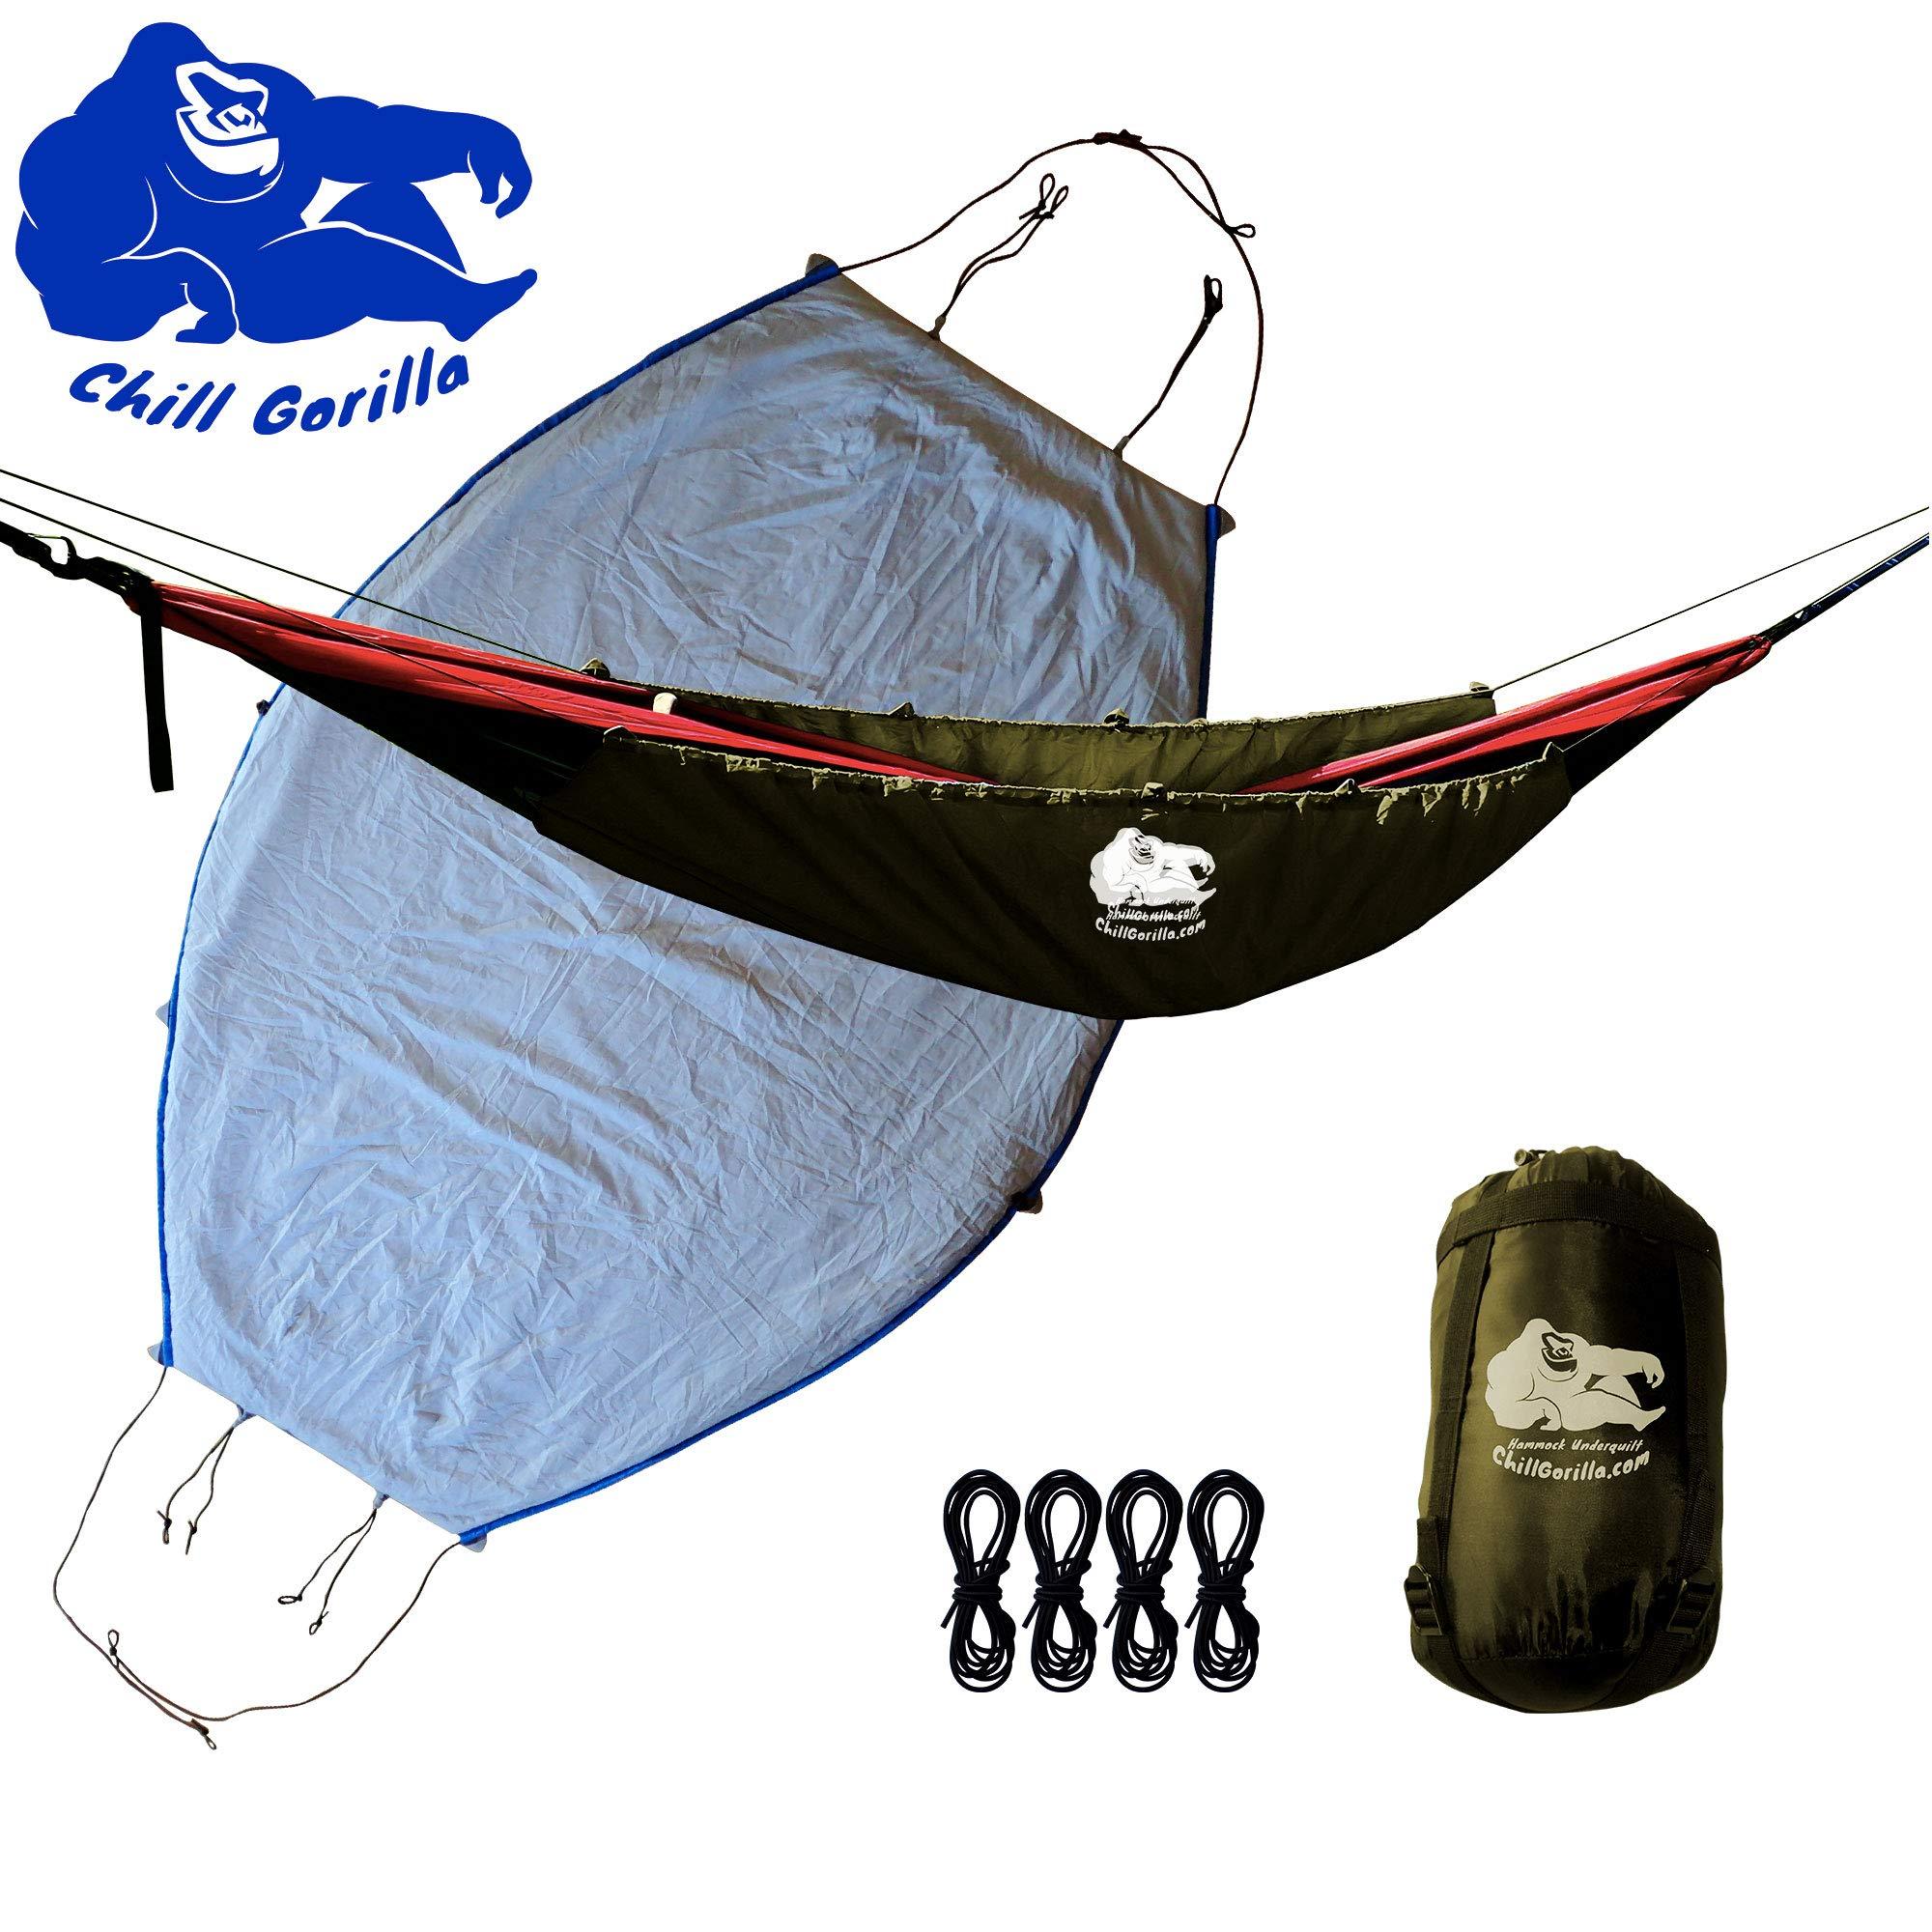 Chill Gorilla Hammock Underquilt. Lightweight Camping Quilt. Hammock Camping Accessories. OD Green by Chill Gorilla